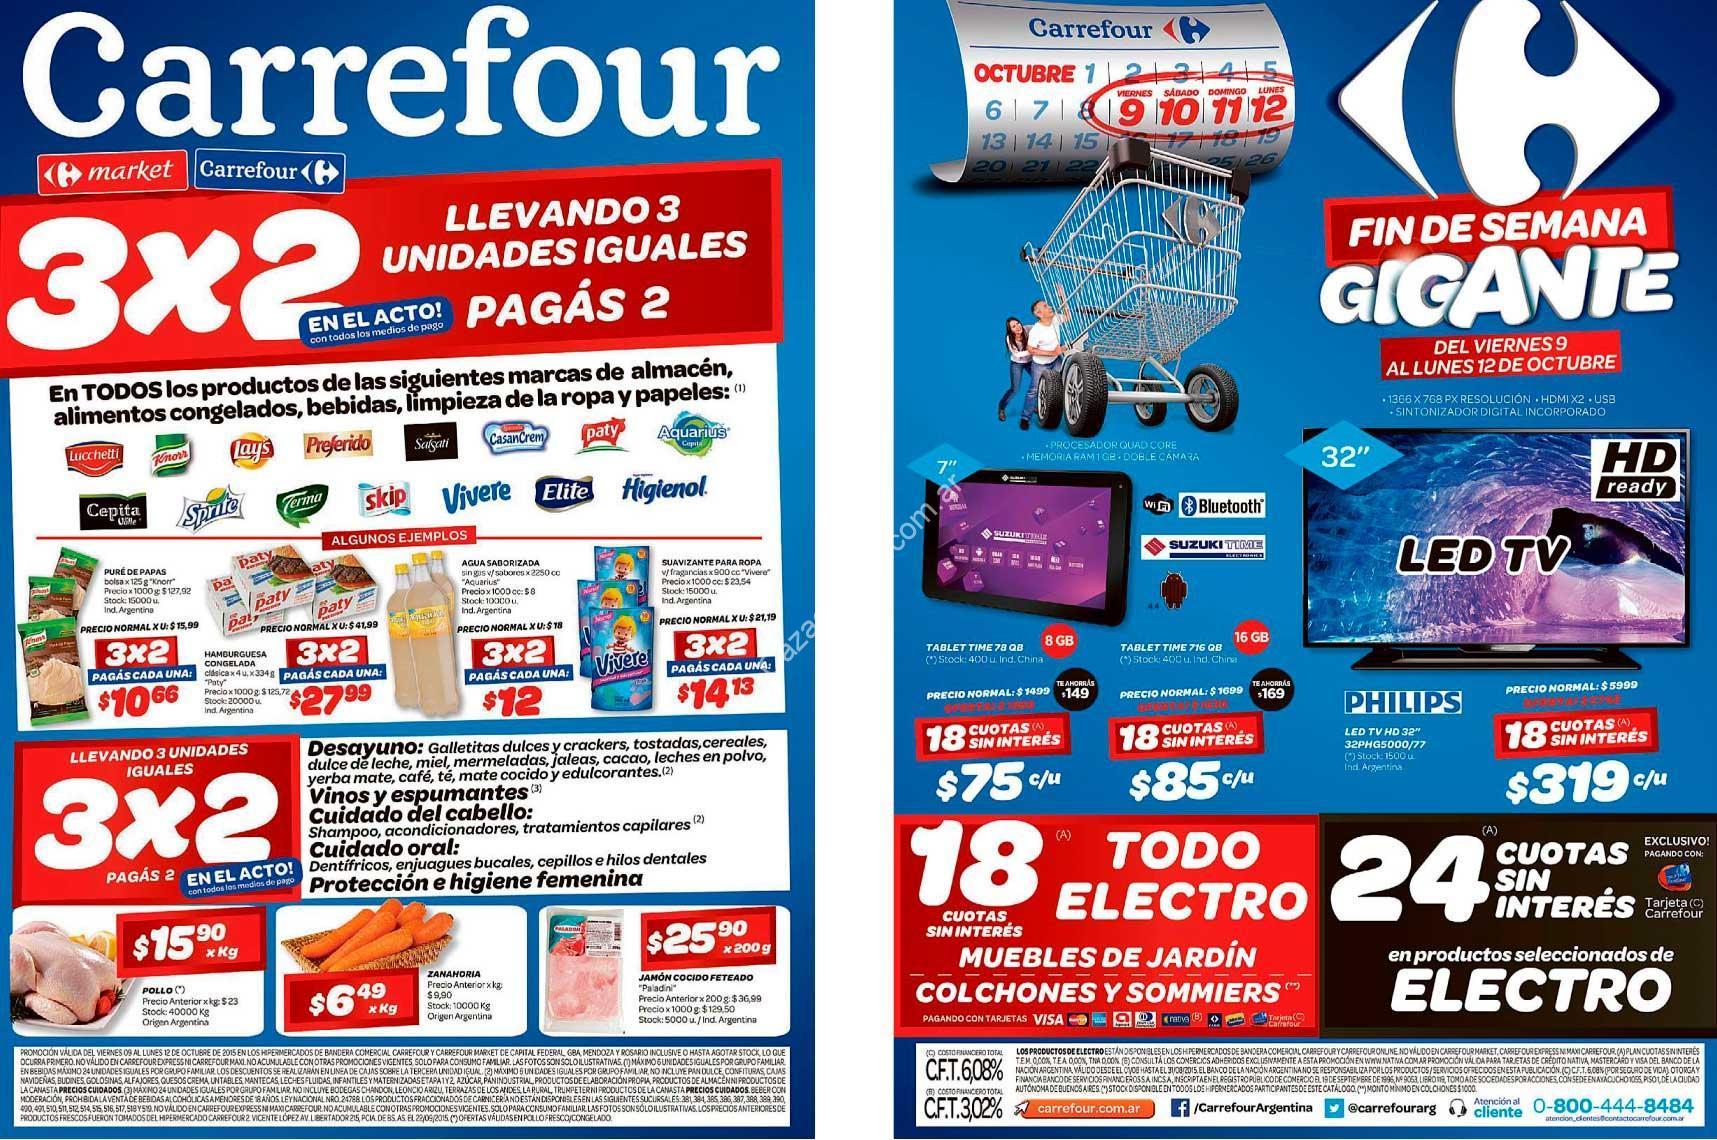 Carrefour Colchones Great Oferta Carrefour De Descuento En Tu  ~ Colchones Enrollados Baratos Carrefour